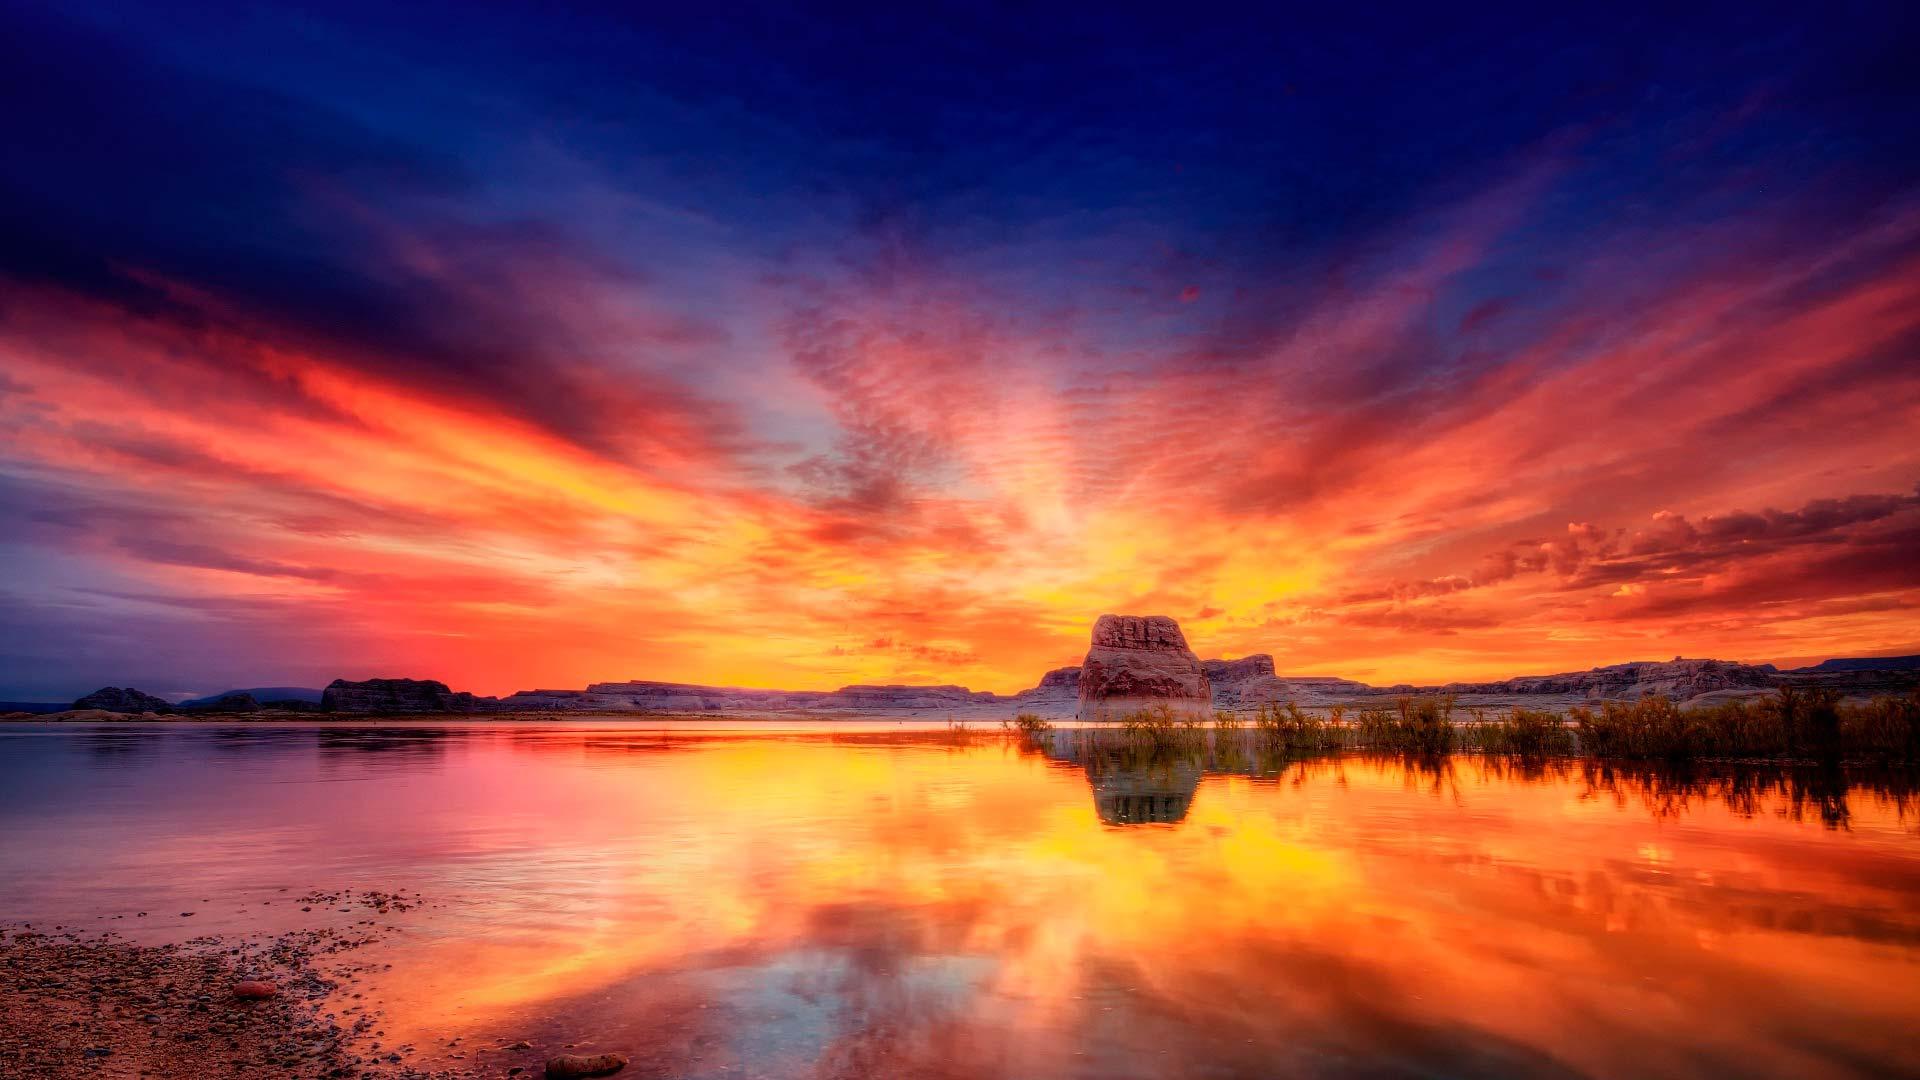 Обои Красивый закат над озером, картинки - Обои для ...: http://www.fullhdoboi.ru/photo/nature/krasivyj_zakat_nad_ozerom/6-0-23076